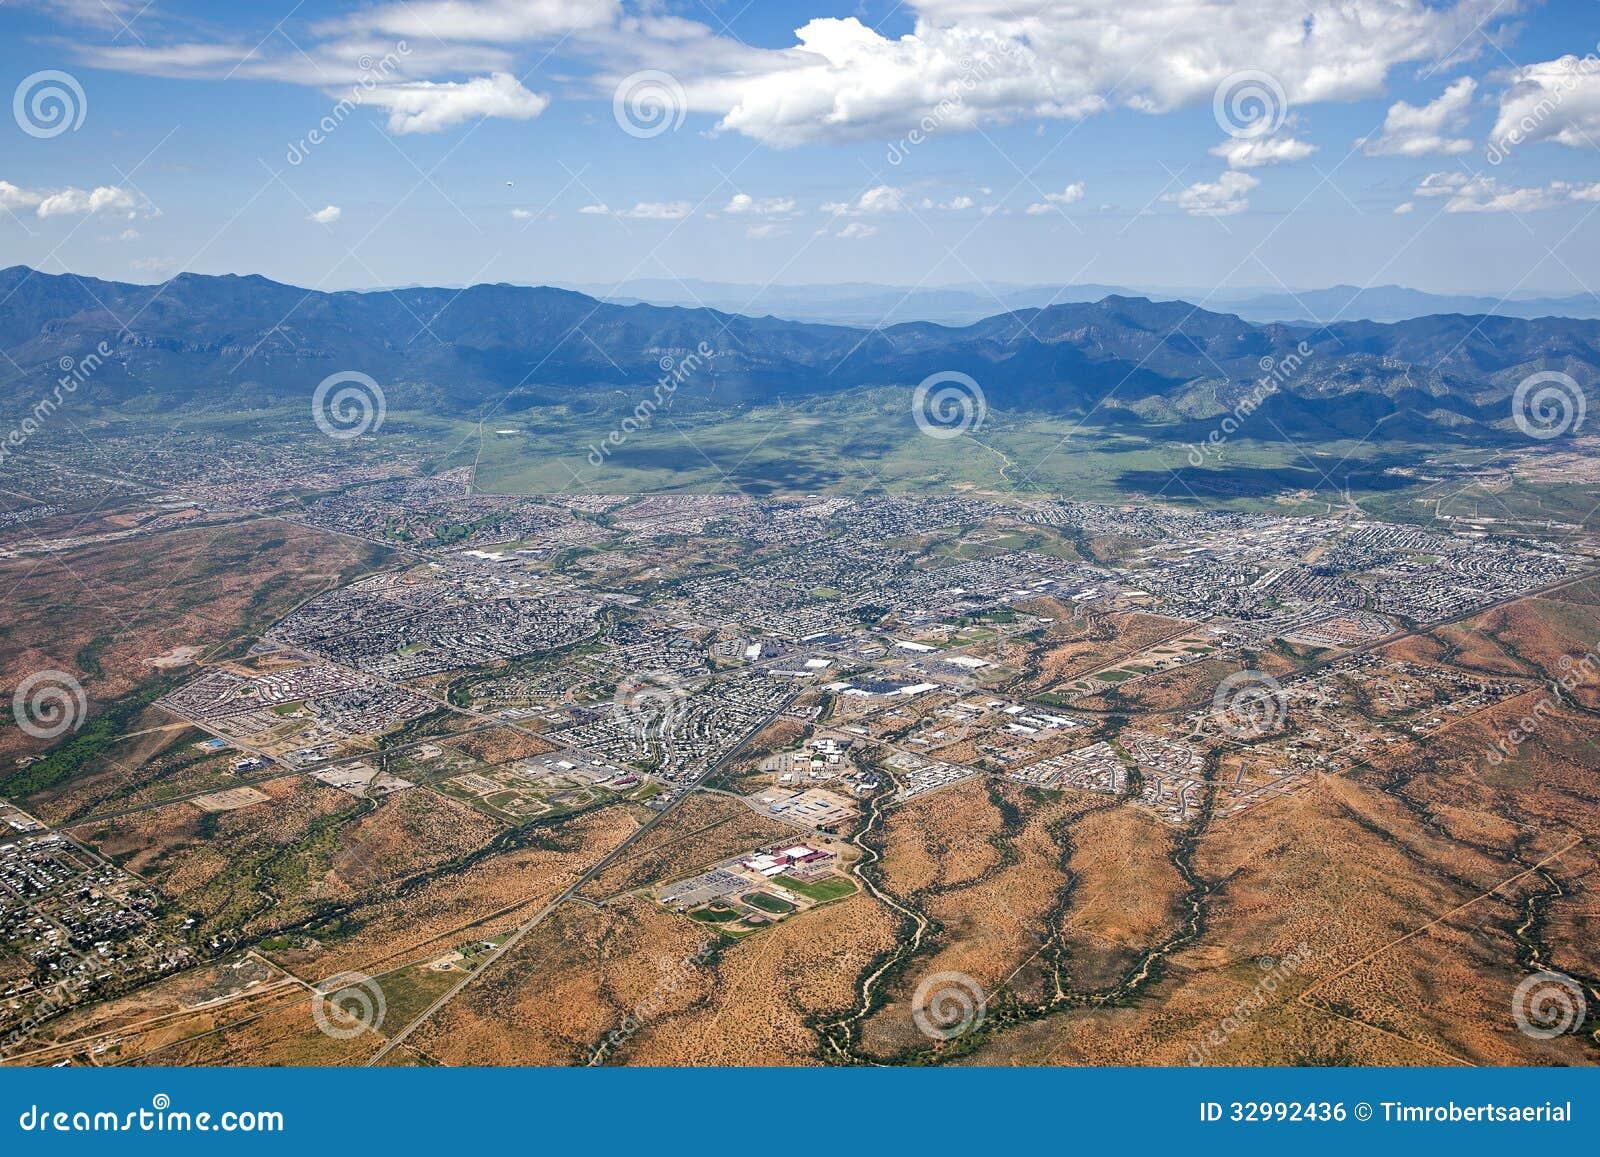 Sierra Vista (AZ) United States  city pictures gallery : Sierra Vista, Arizona Royalty Free Stock Image Image: 32992436